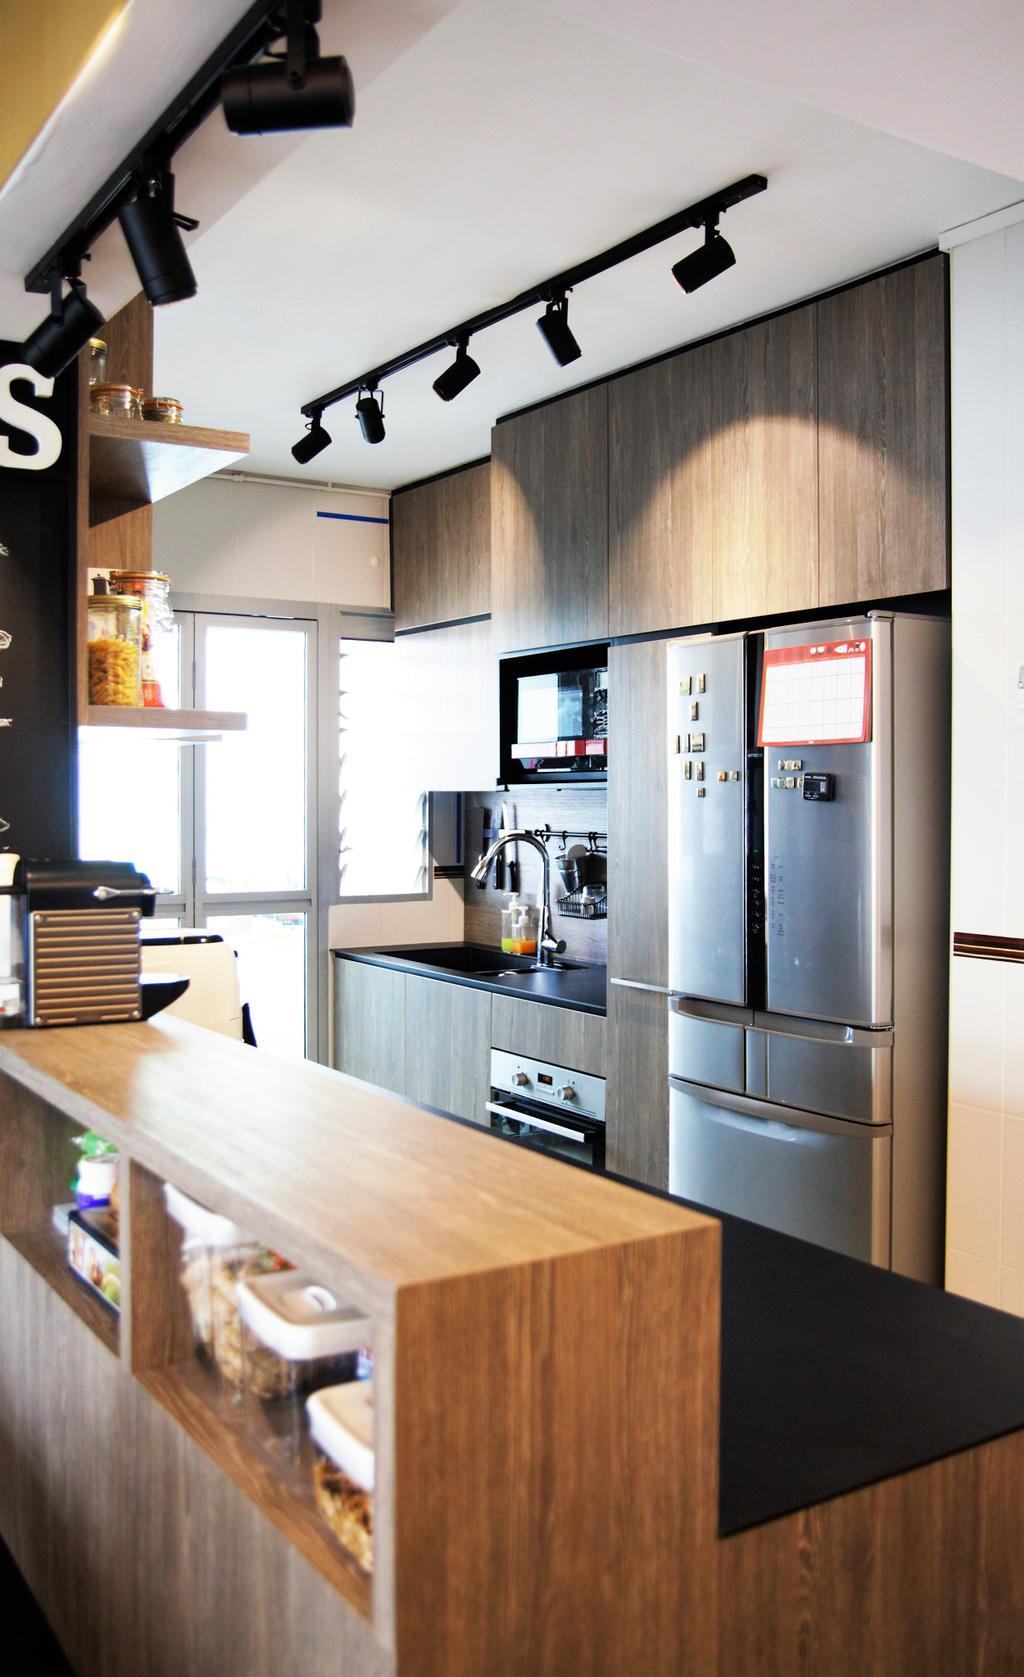 HDB, Punggol, Interior Designer, Intrigue-d Design Consultancy, Appliance, Electrical Device, Fridge, Refrigerator